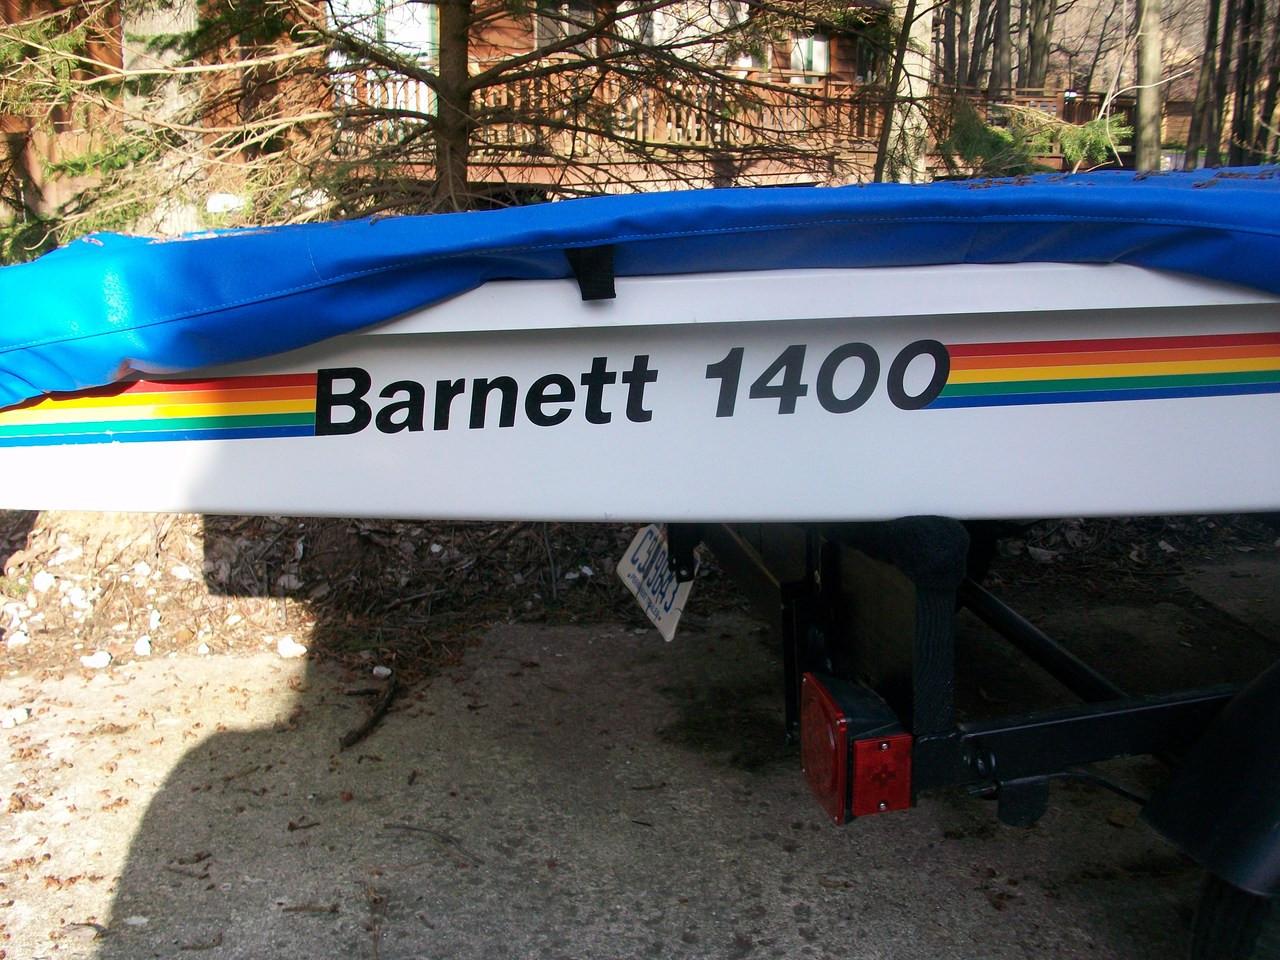 Barnett 1400 Sailboat Deck Cover by SLO Sail and Canvas. Shown in Top Gun Caribbean Blue.